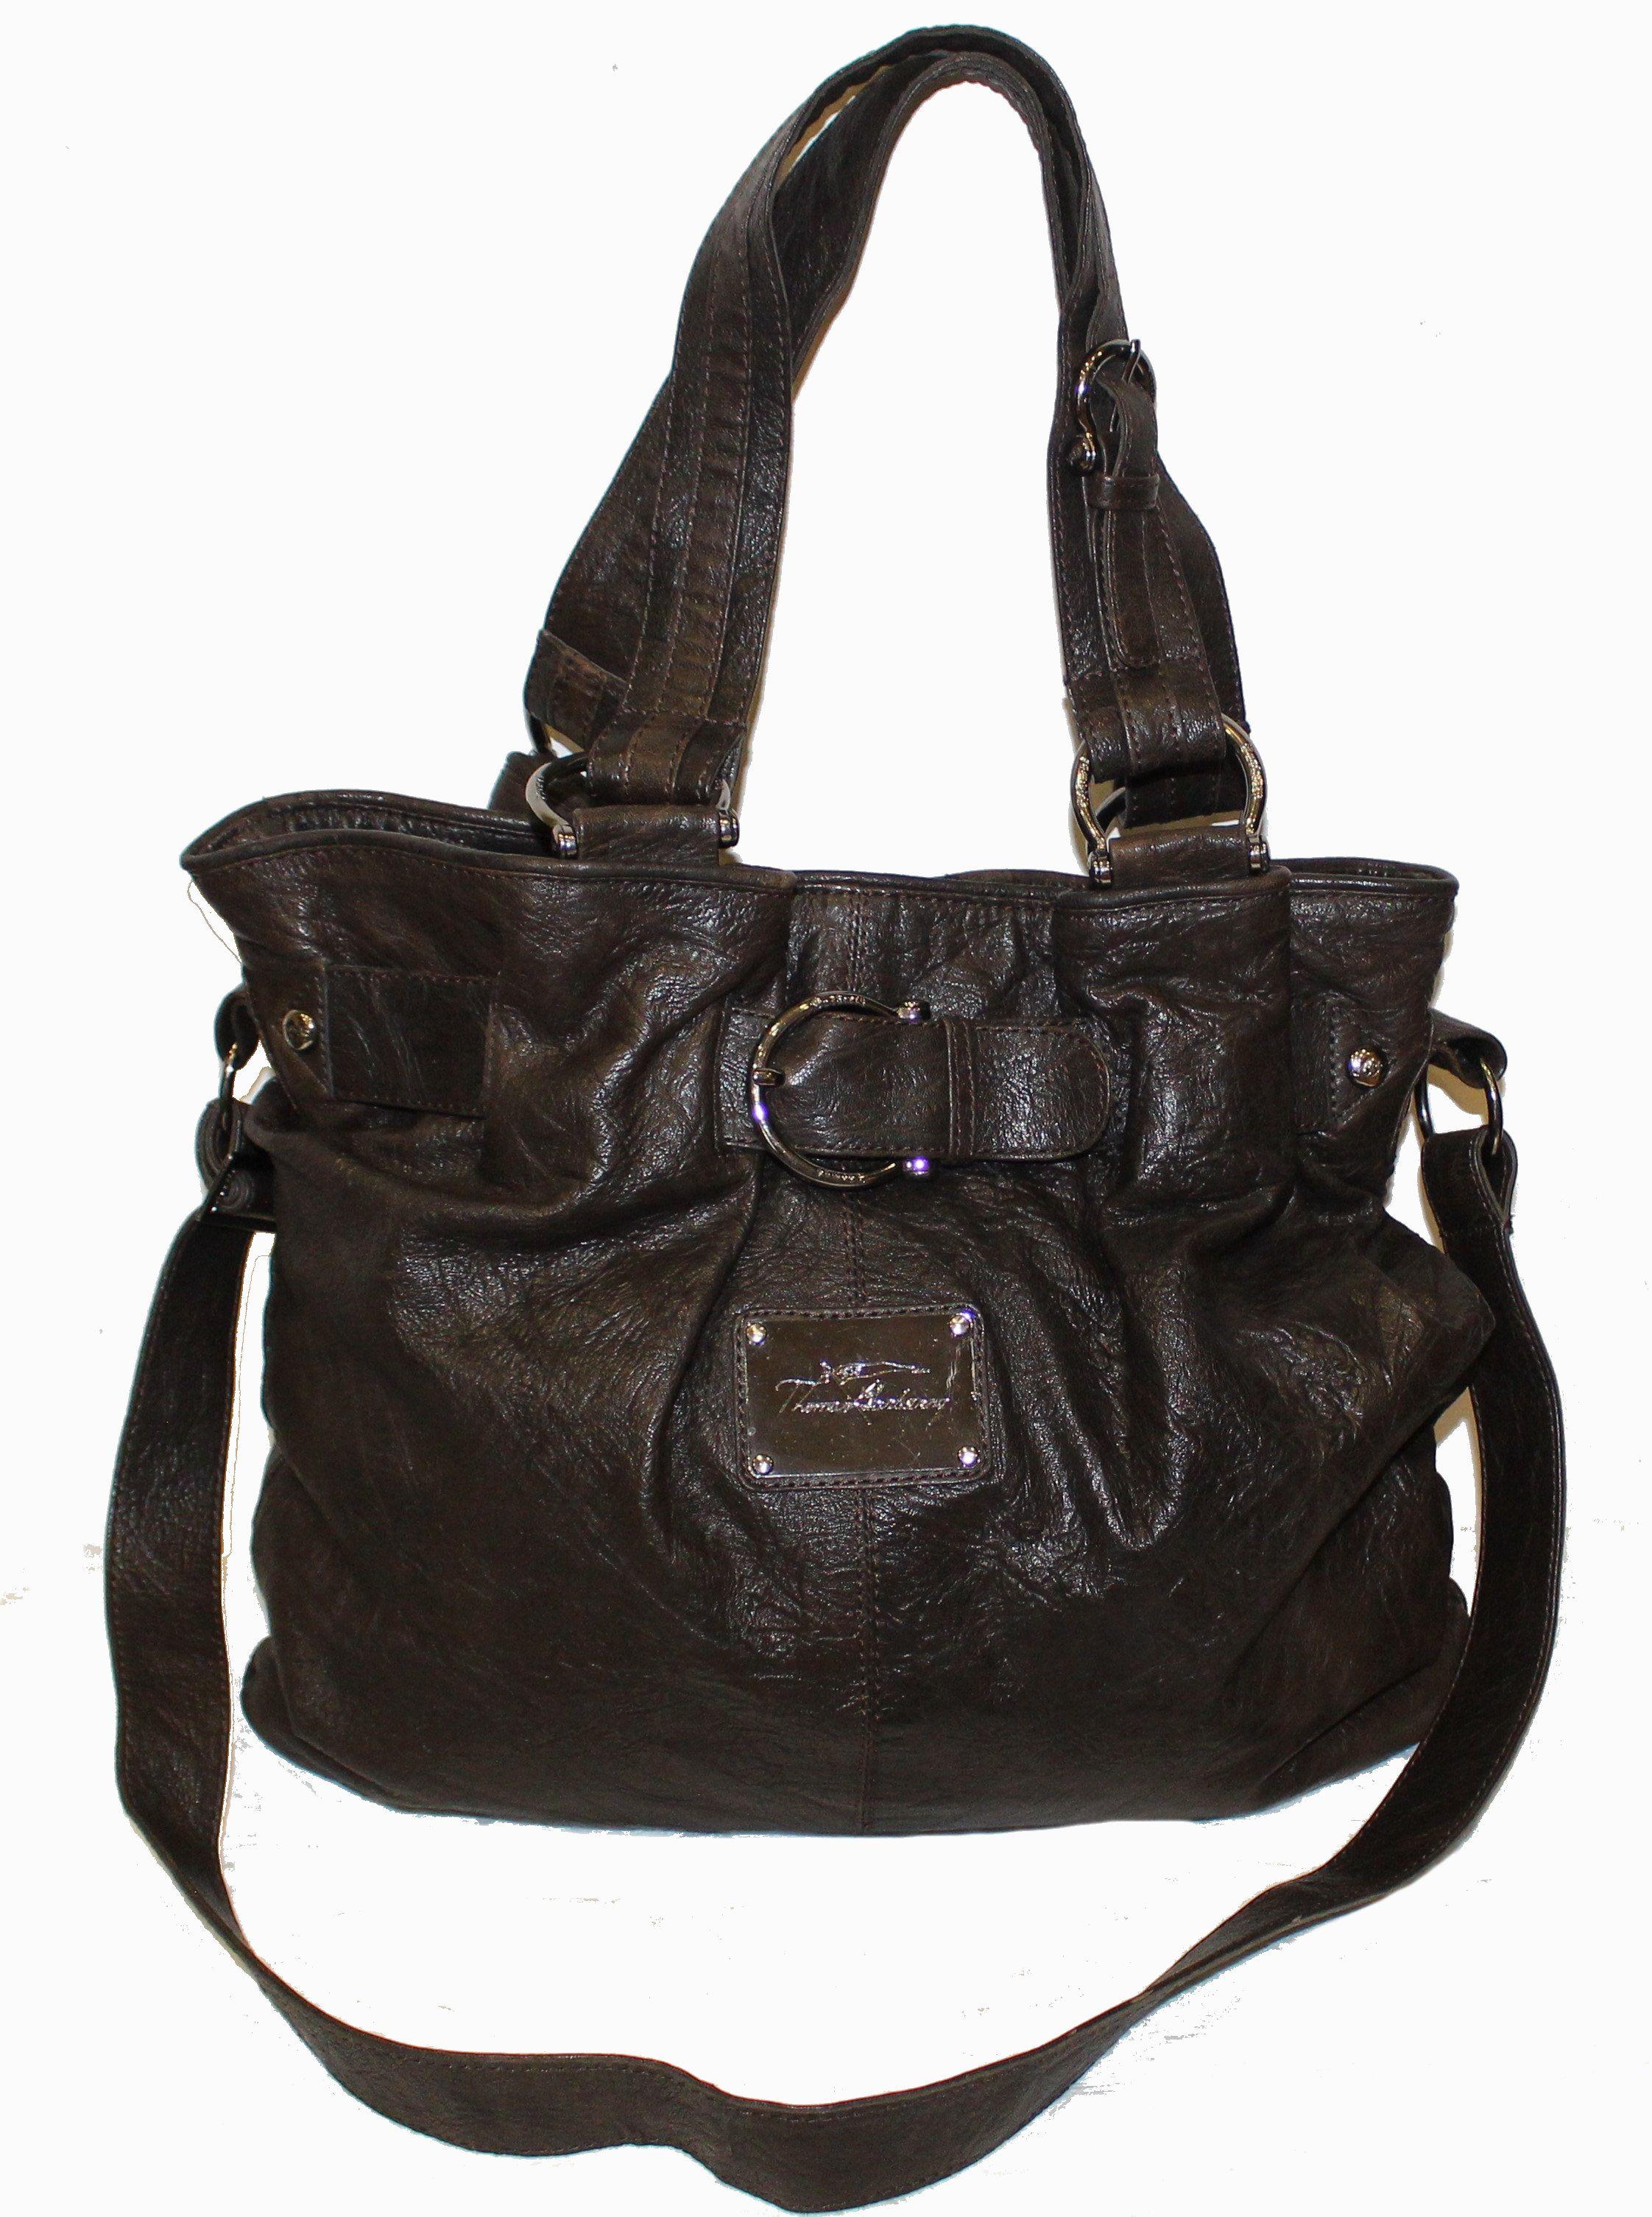 THOMAS BURBERRY XL Tasche Leder dunkelbraun   Taschen leder